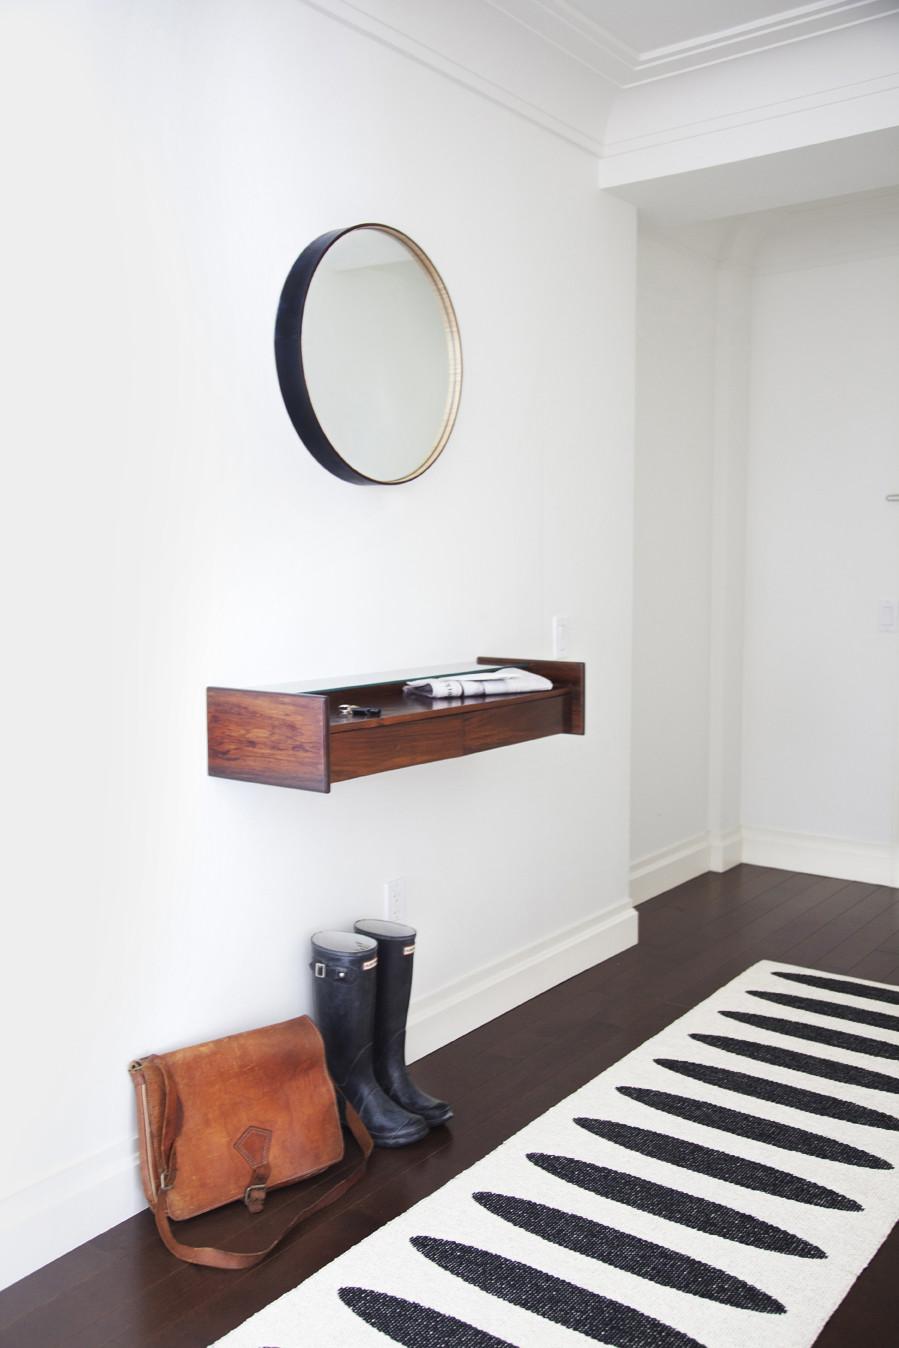 minimalist design of the apartment entrance